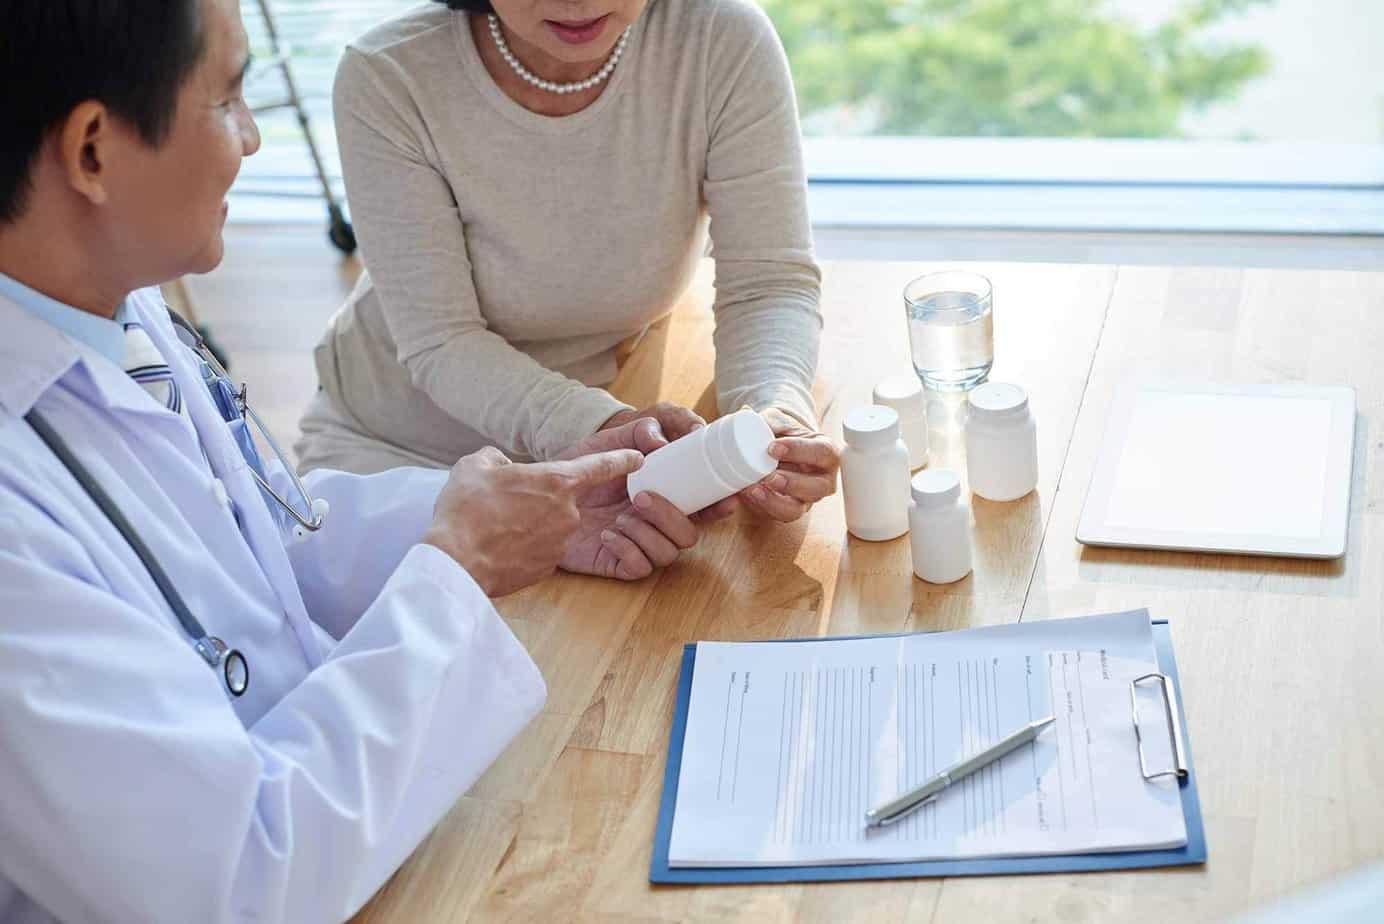 psychiatrist reviewing prescription pills